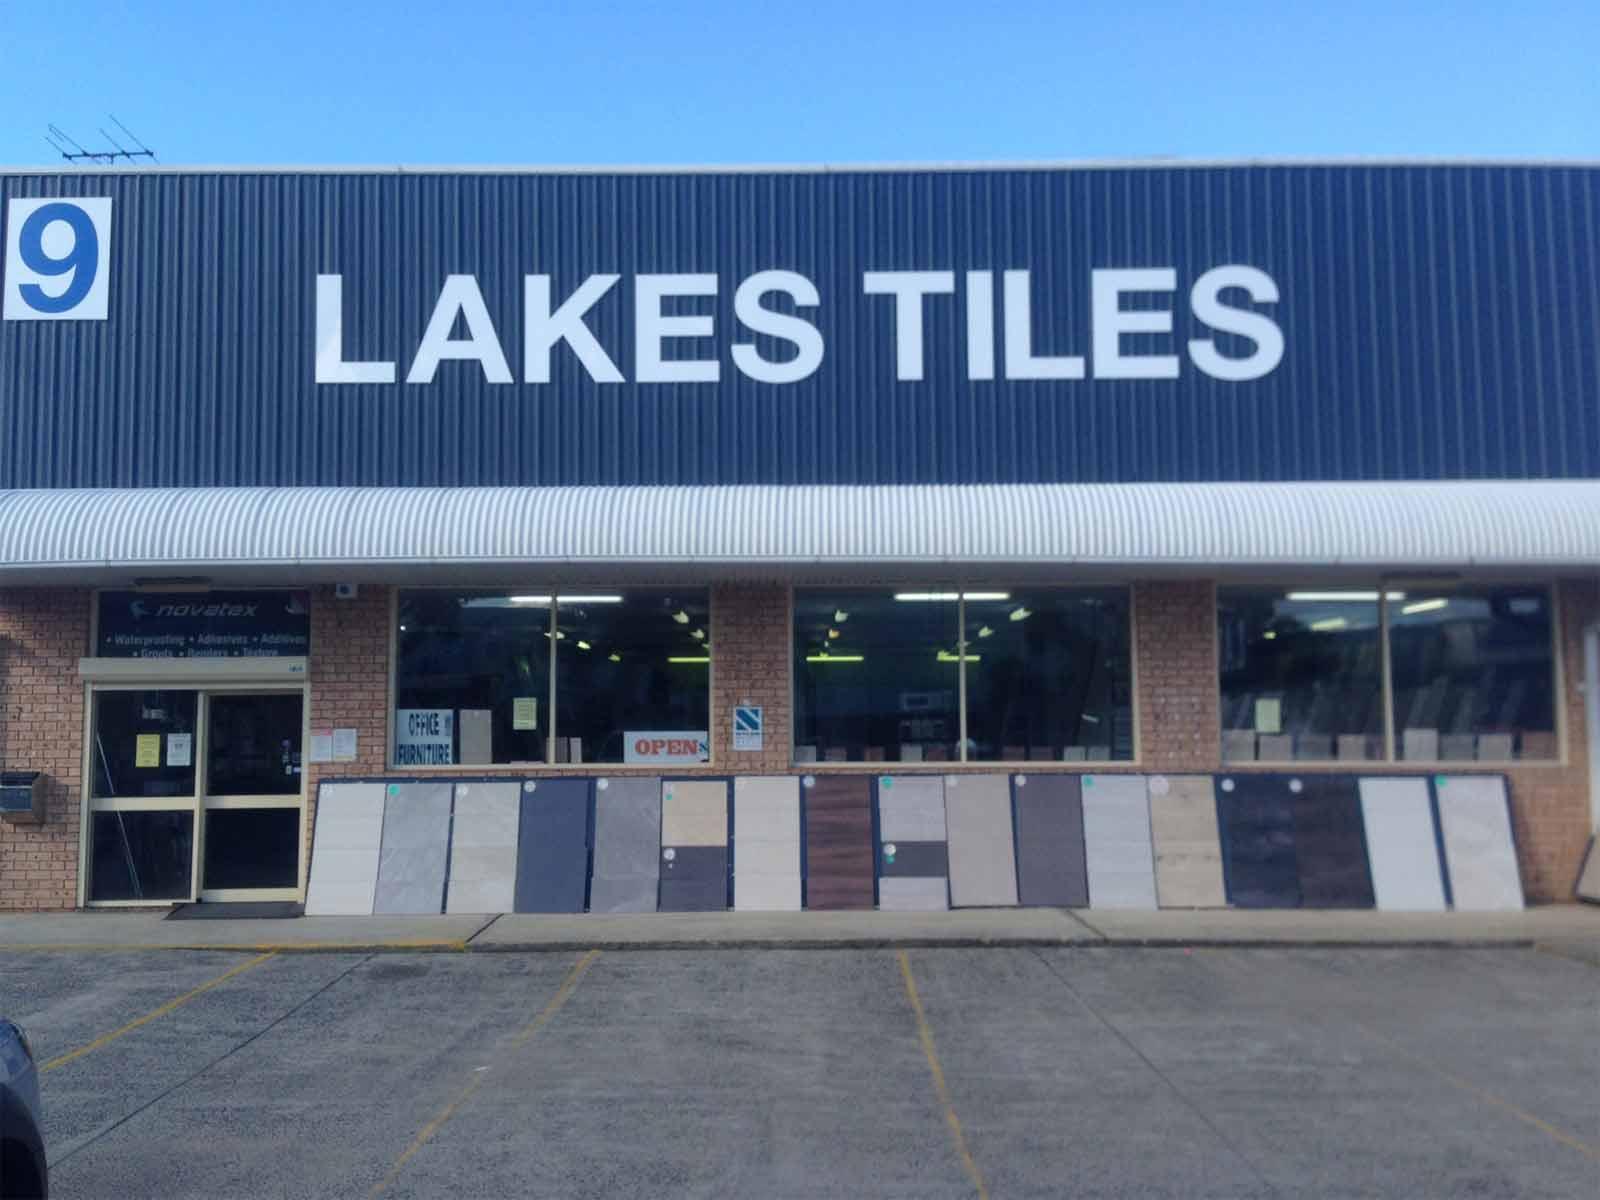 lakes tiles central coast lakes tiles office building